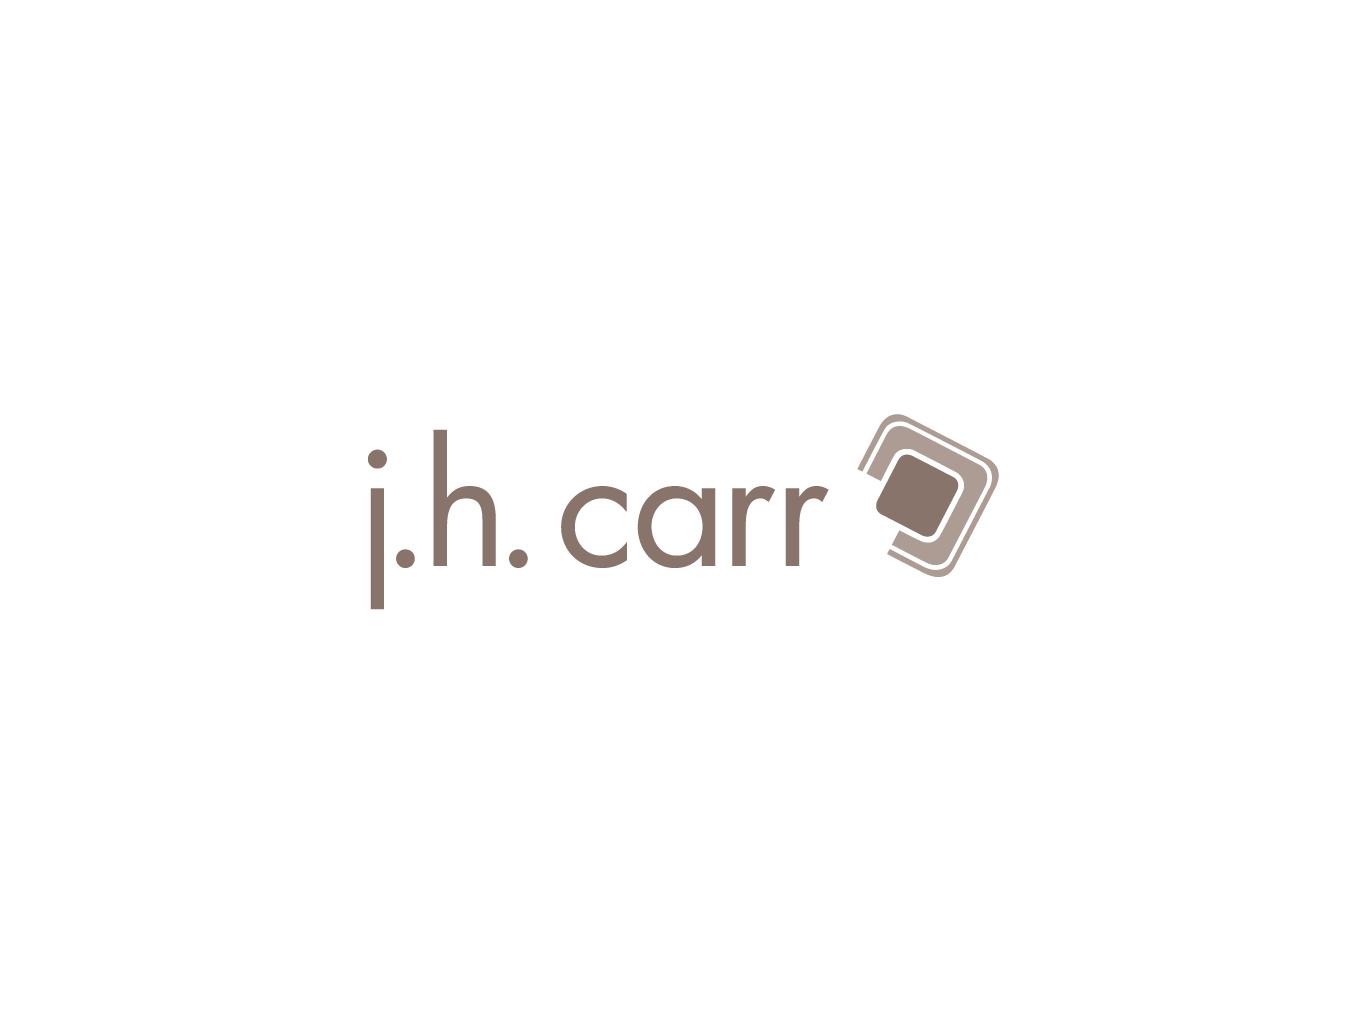 JHCarrLogo